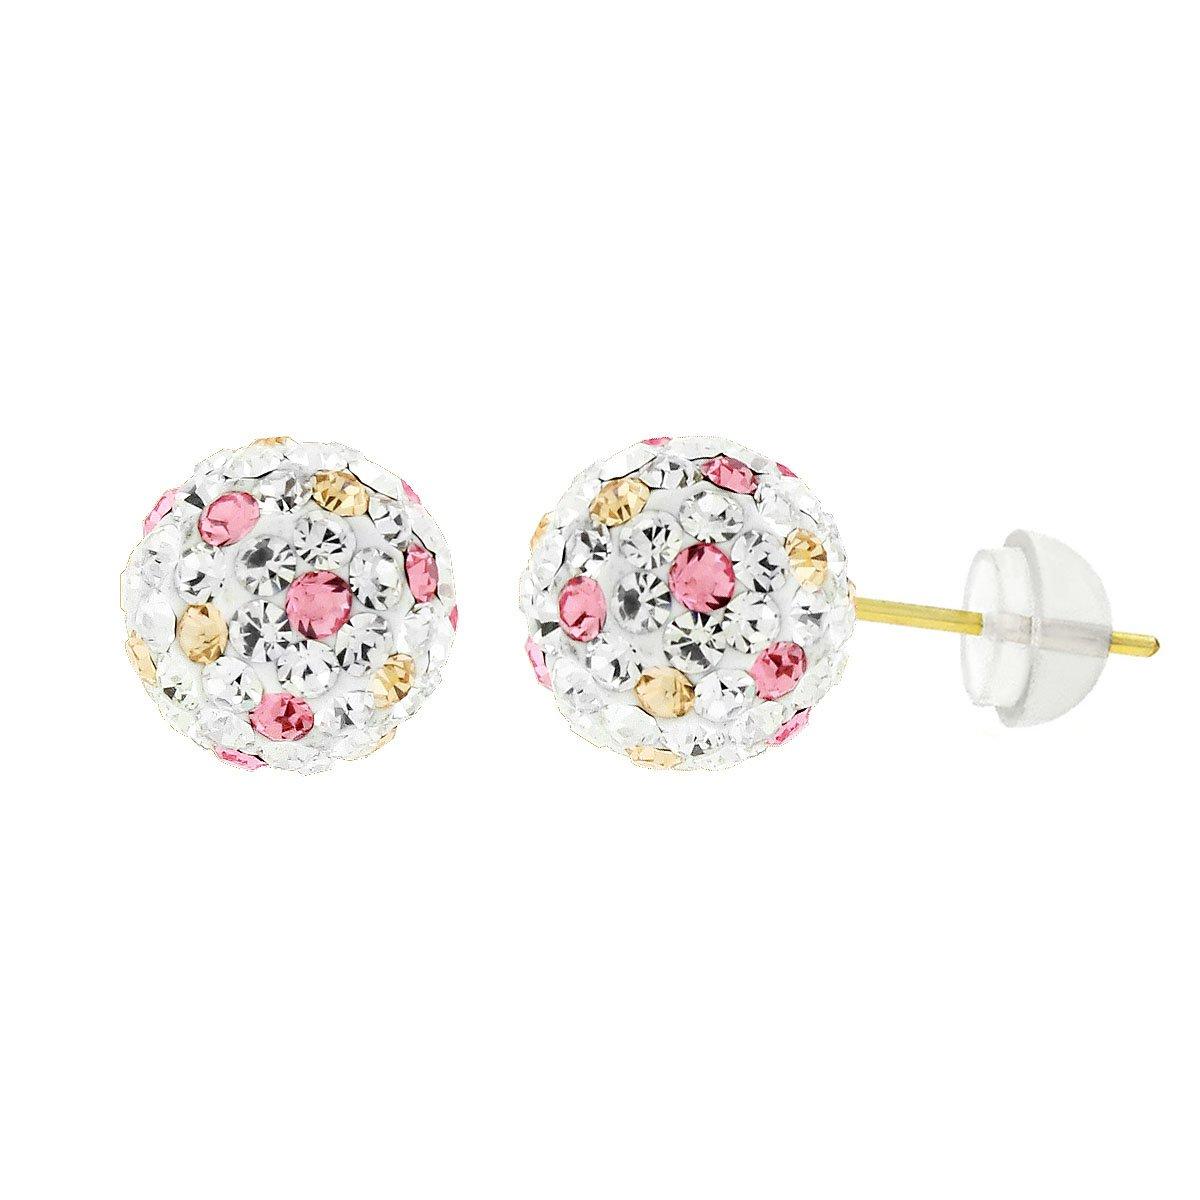 14k Yellow Gold Womens 8mm Austrian Crystal Ball Studs Earrings (White/Peach/Pink)